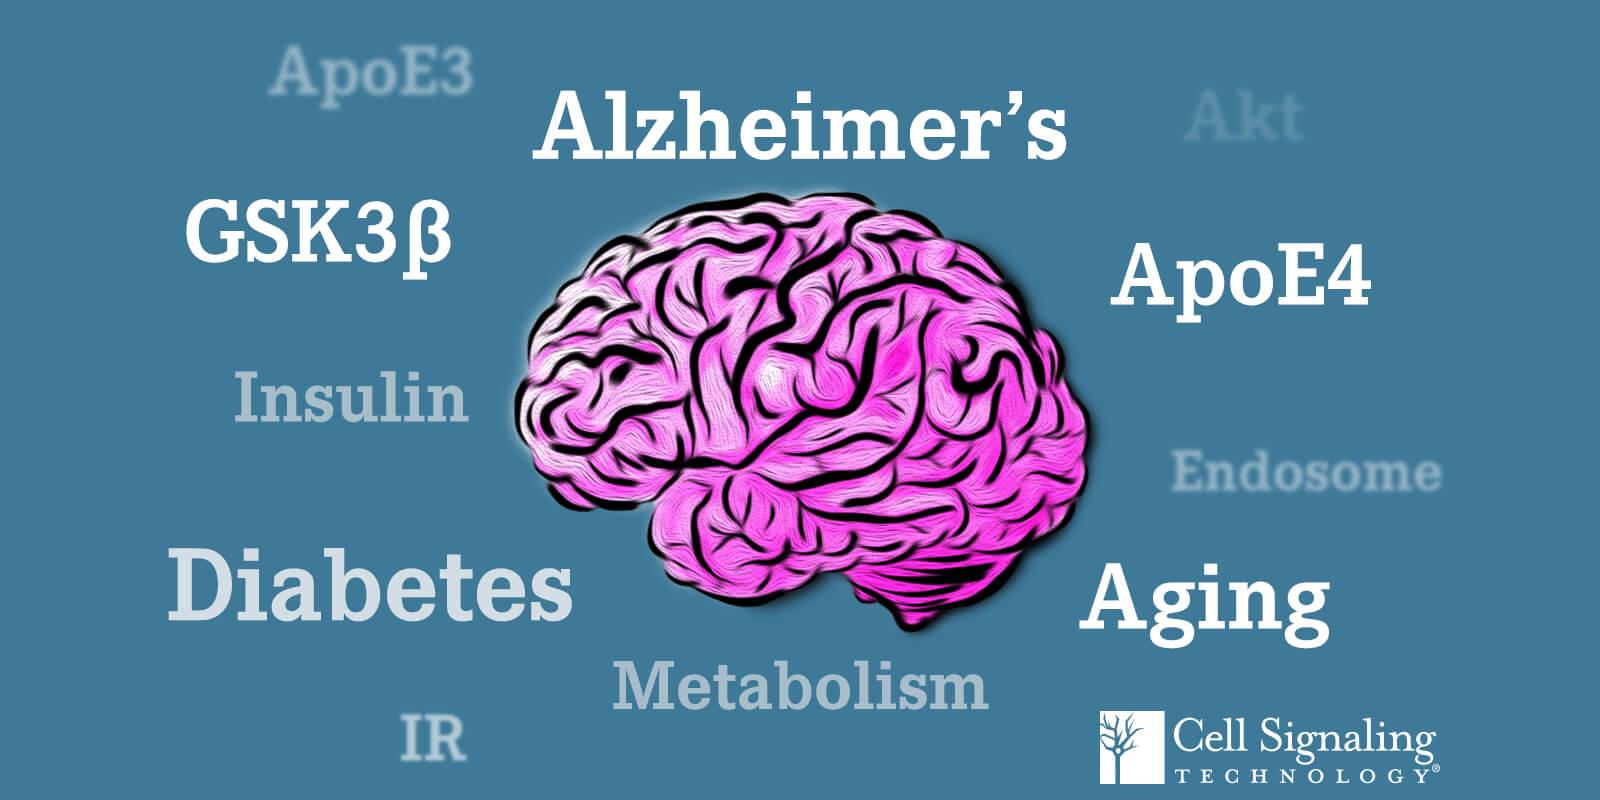 ApoE3 ApoE4 Akt Aging Alzheimer's Metabolism Insulin Diabetes